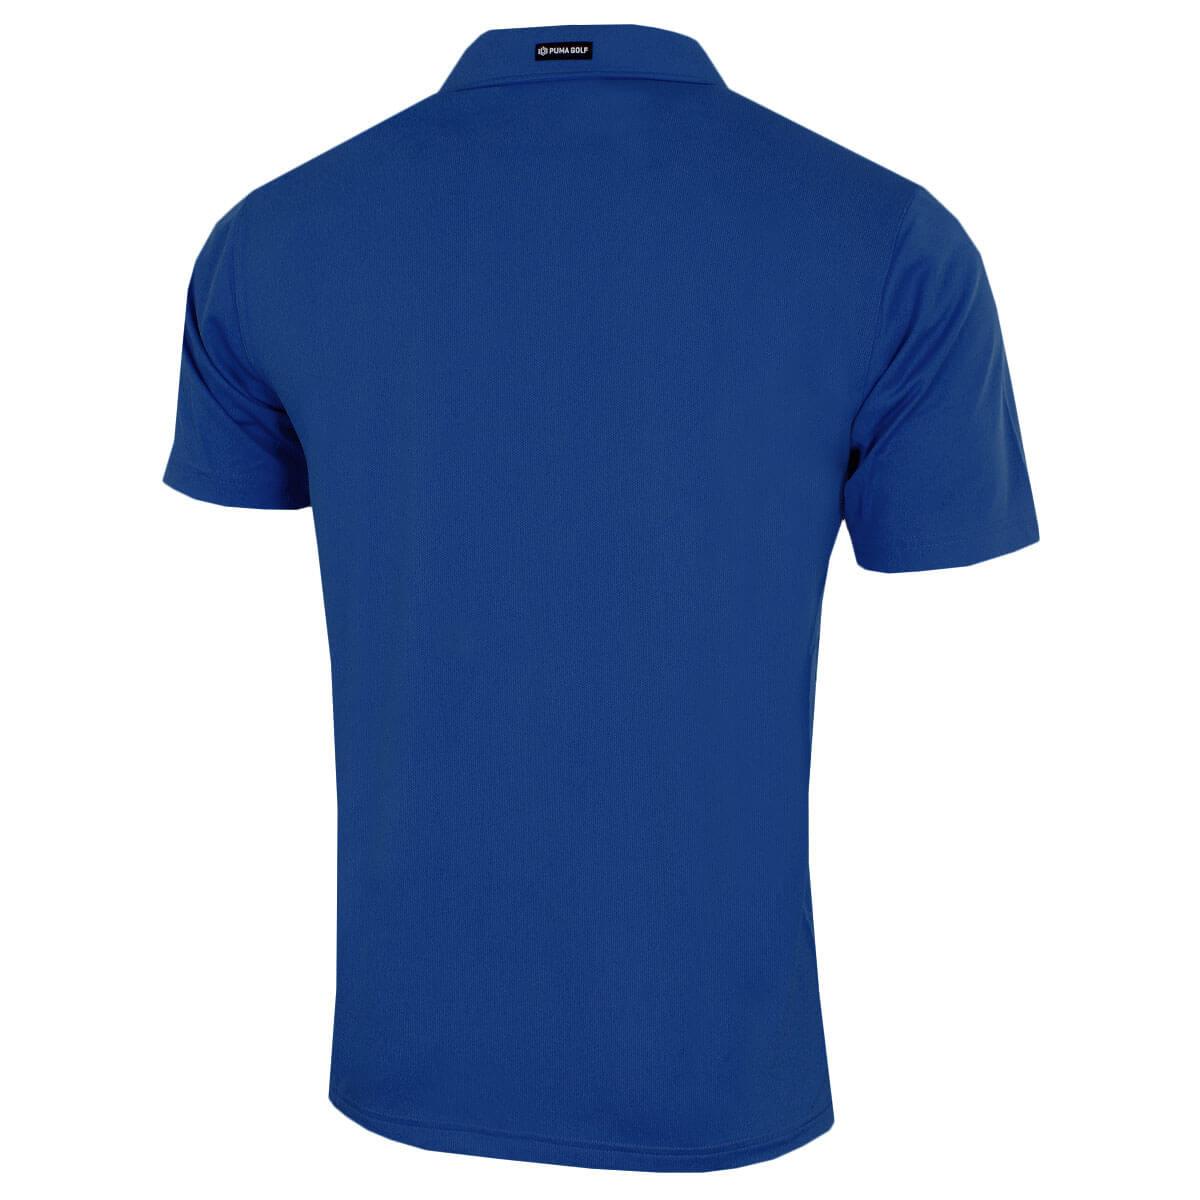 Puma-Golf-Mens-Essential-Pounce-Cresting-DryCell-Tech-Polo-Shirt-46-OFF-RRP thumbnail 28